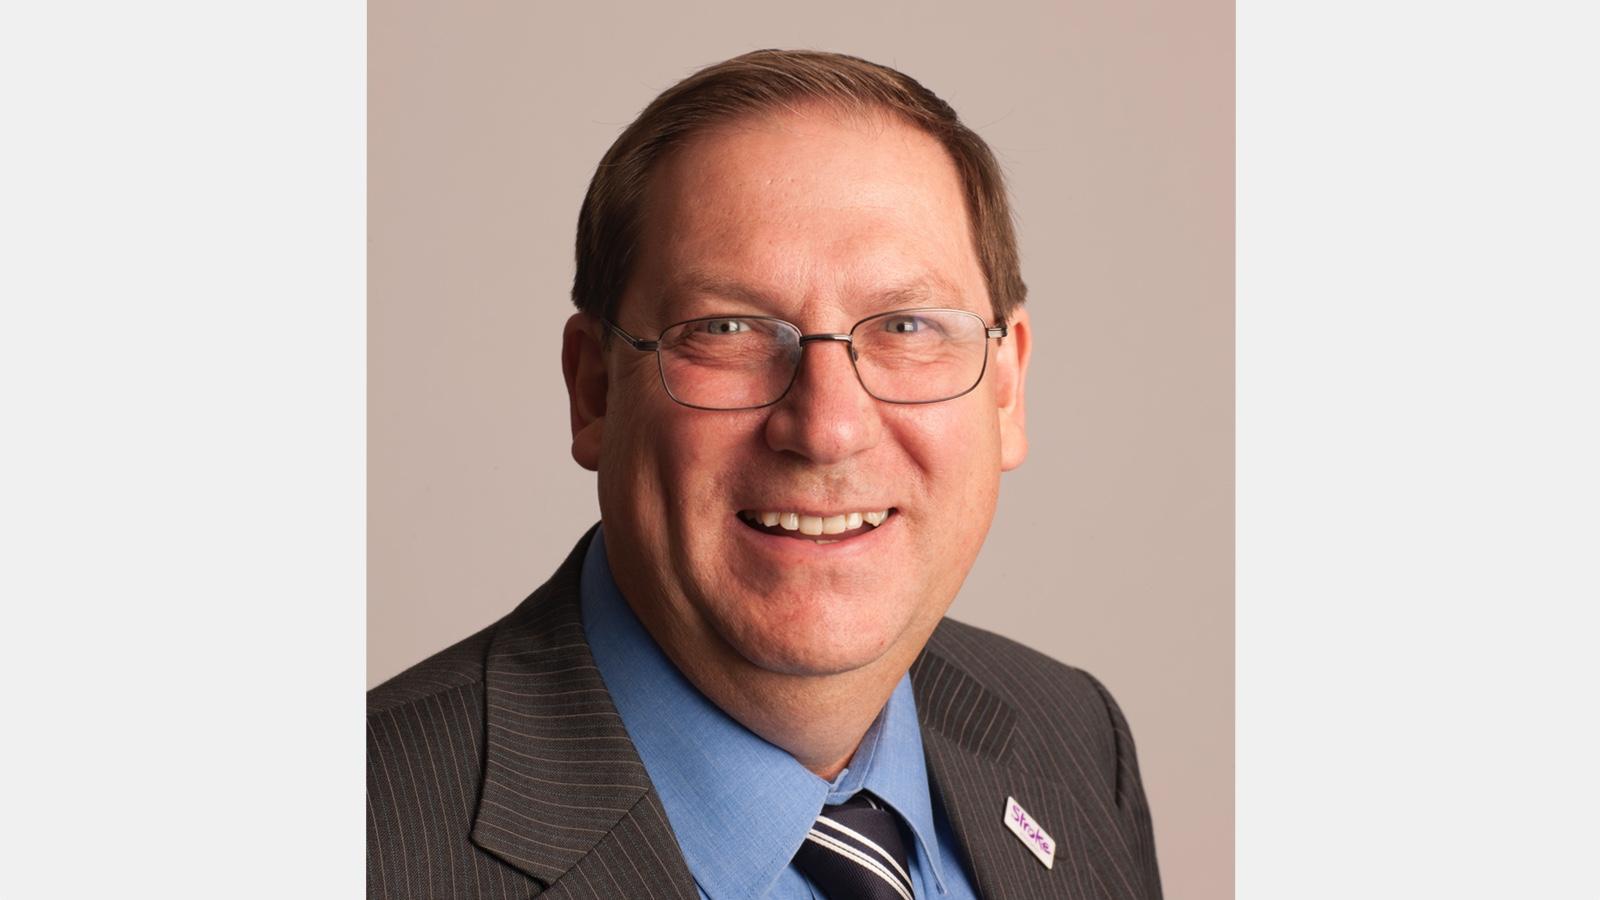 Profile photograph of Mr Jon Barrick